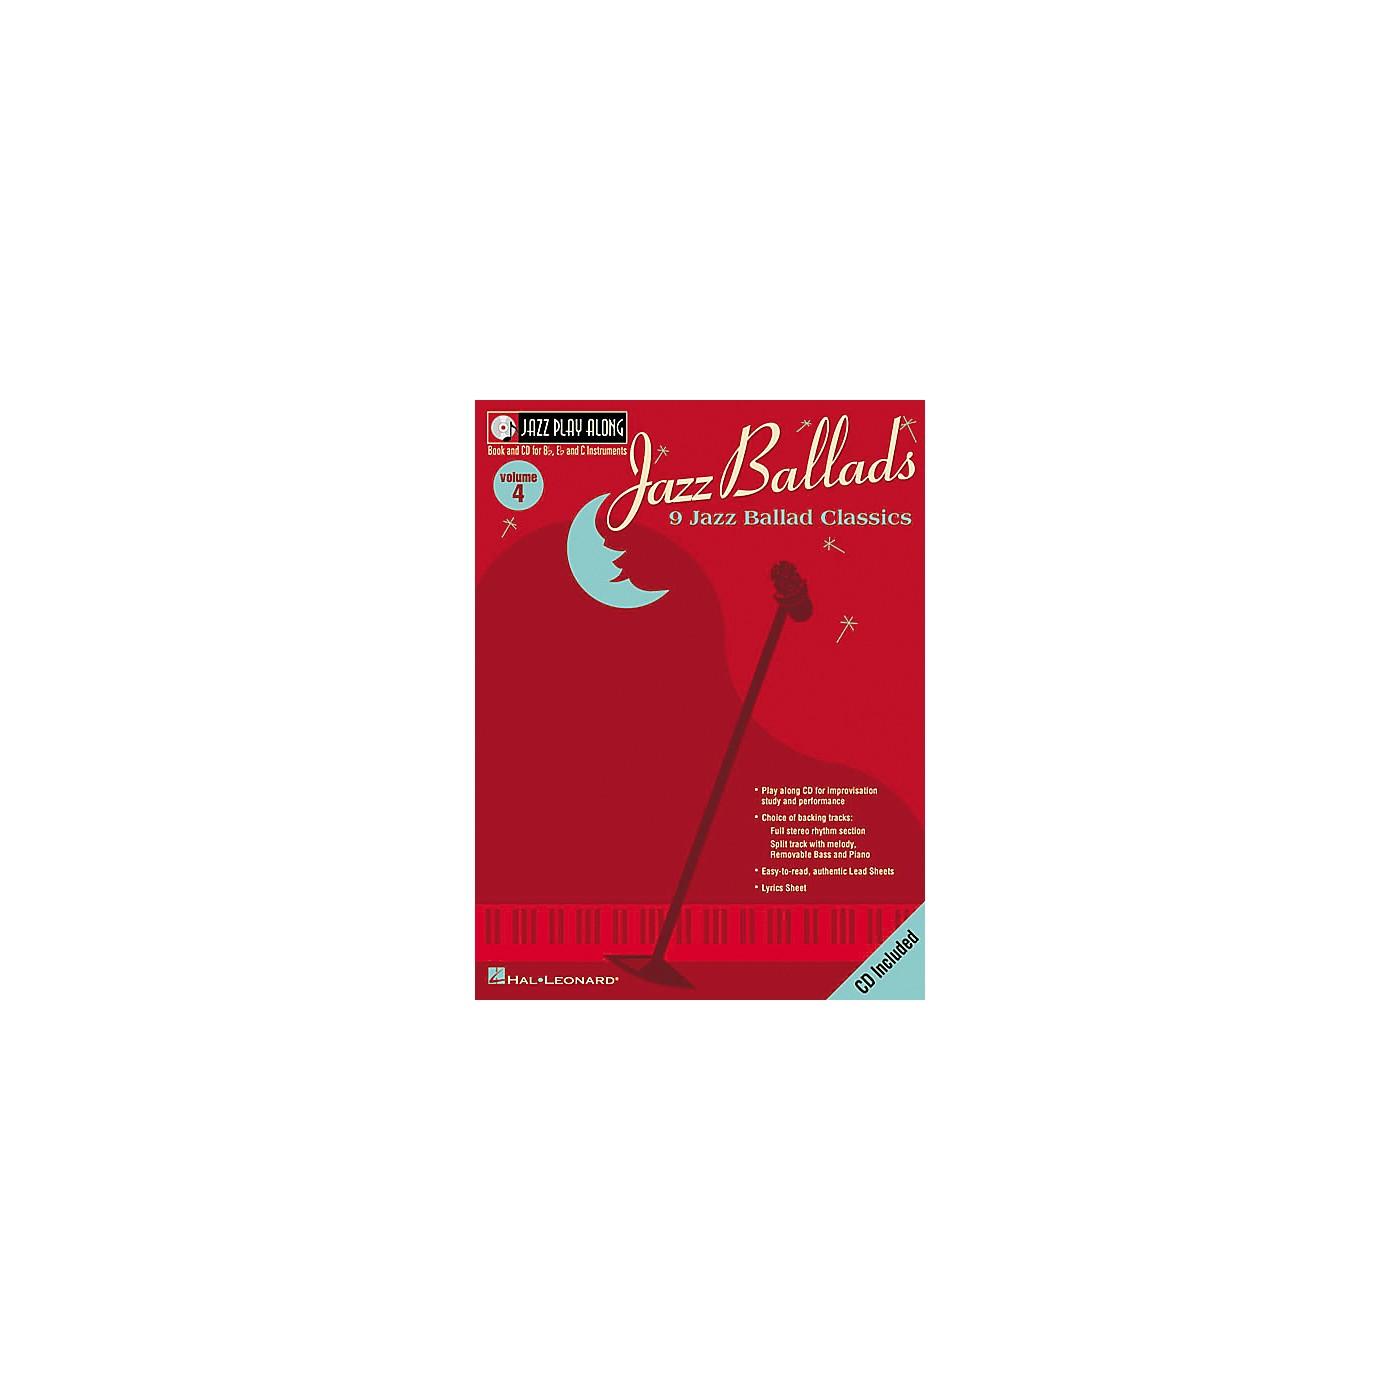 Hal Leonard Jazz Play-Along Series Jazz Ballads Book with CD thumbnail